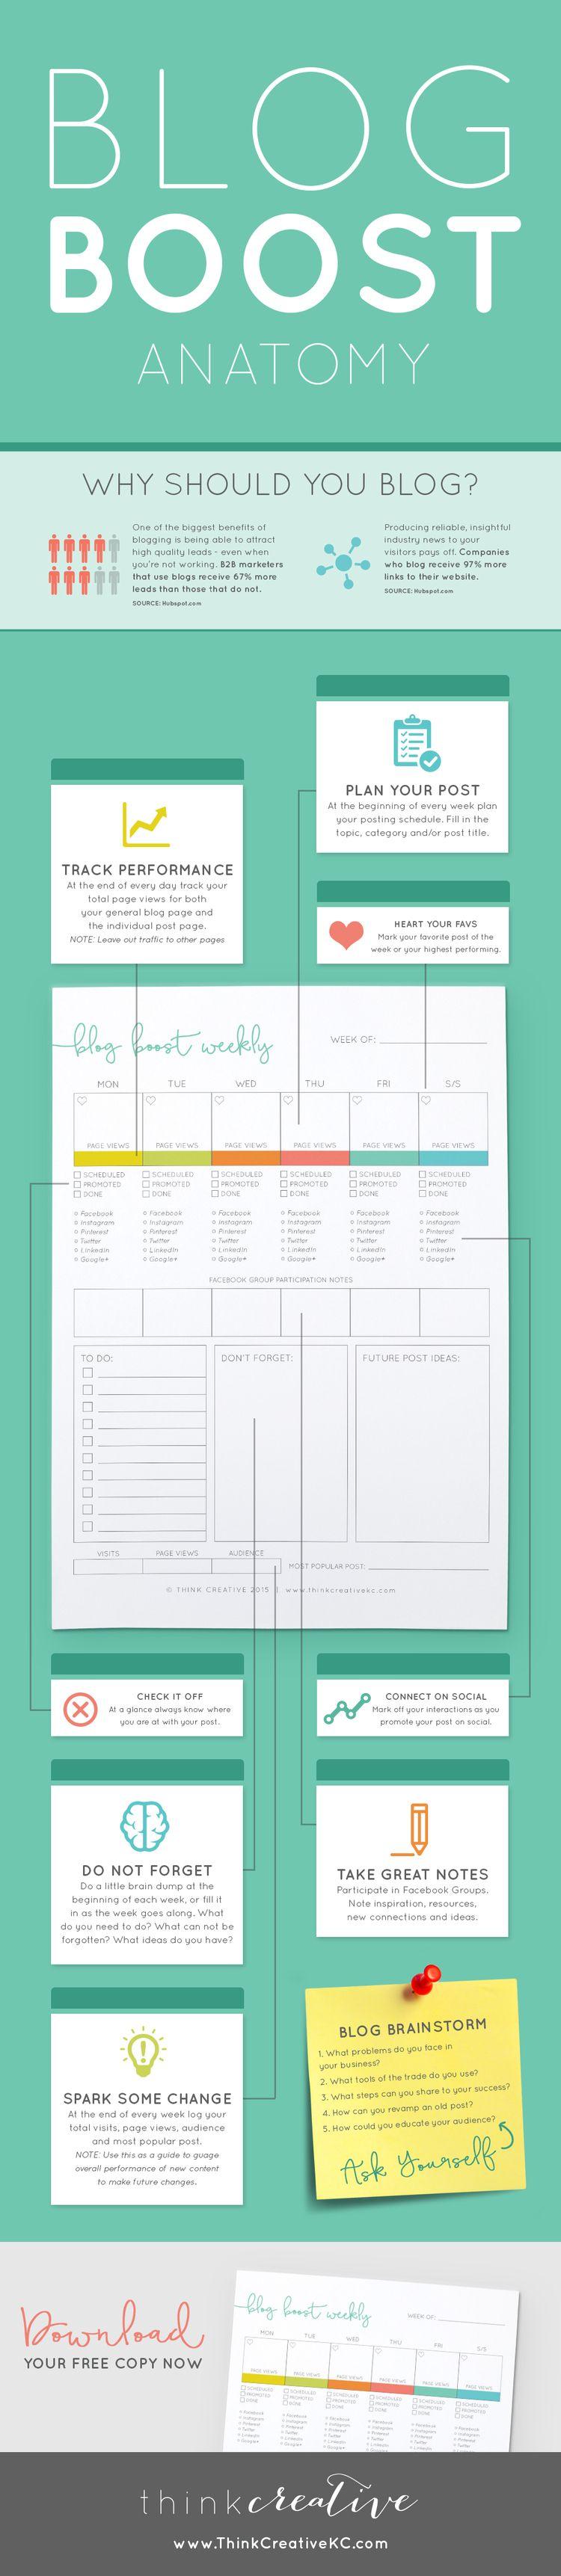 Blog Boost Anatomy Bonus Blog Planning Analysis Printable